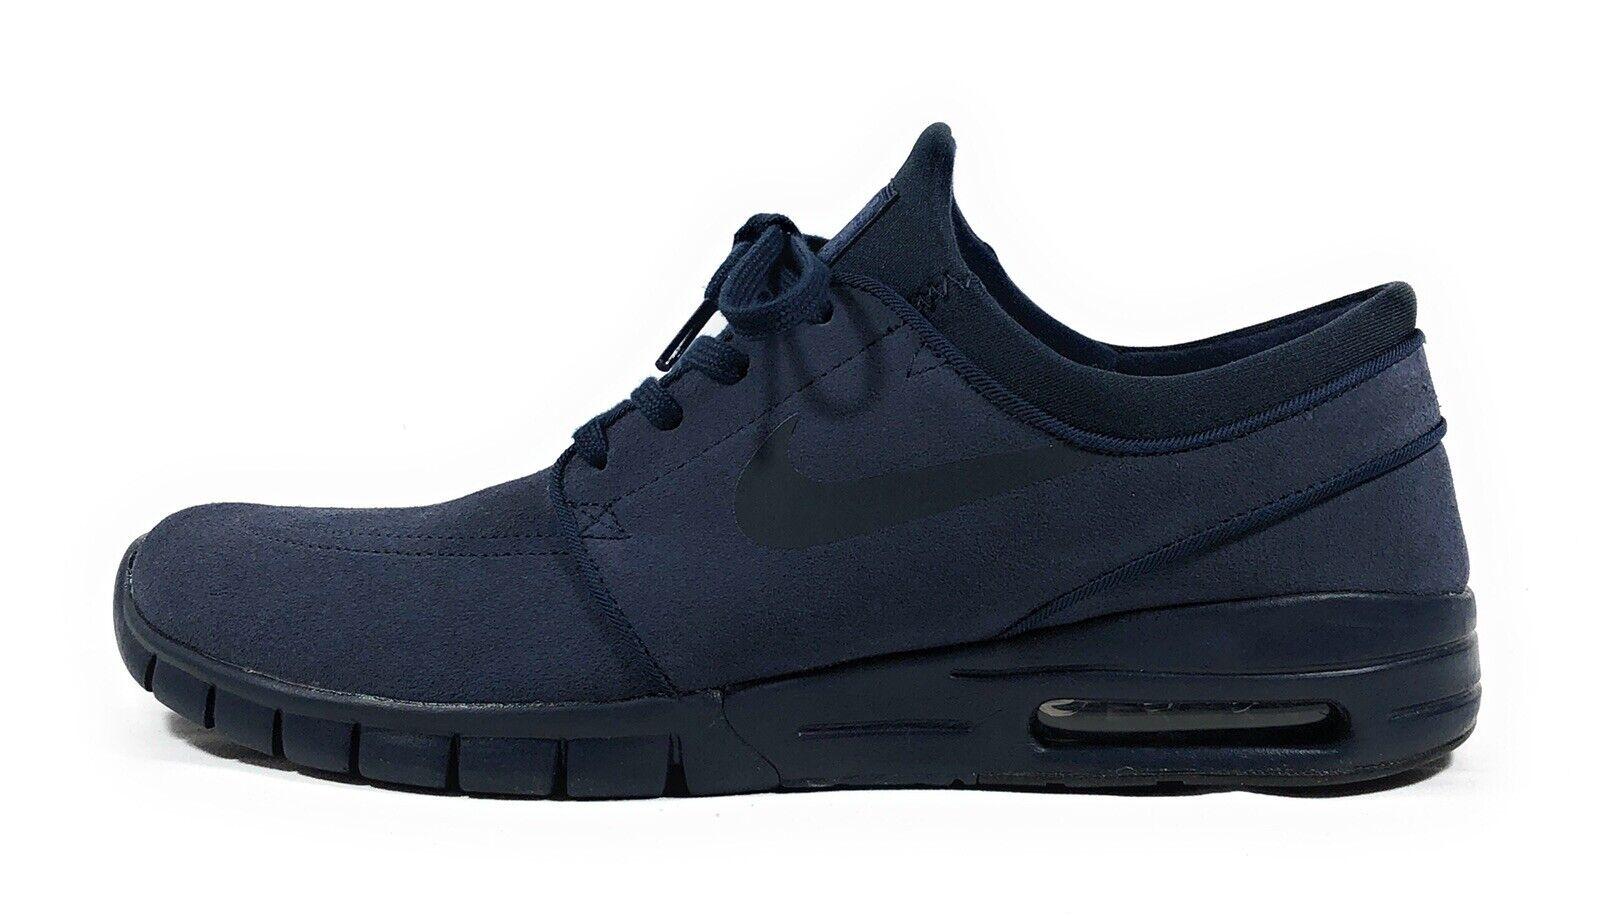 Nike SB Stefan Janoski Max L Hombre LOW TOP zapatillas de obsidiana 685299-440 Talla 10